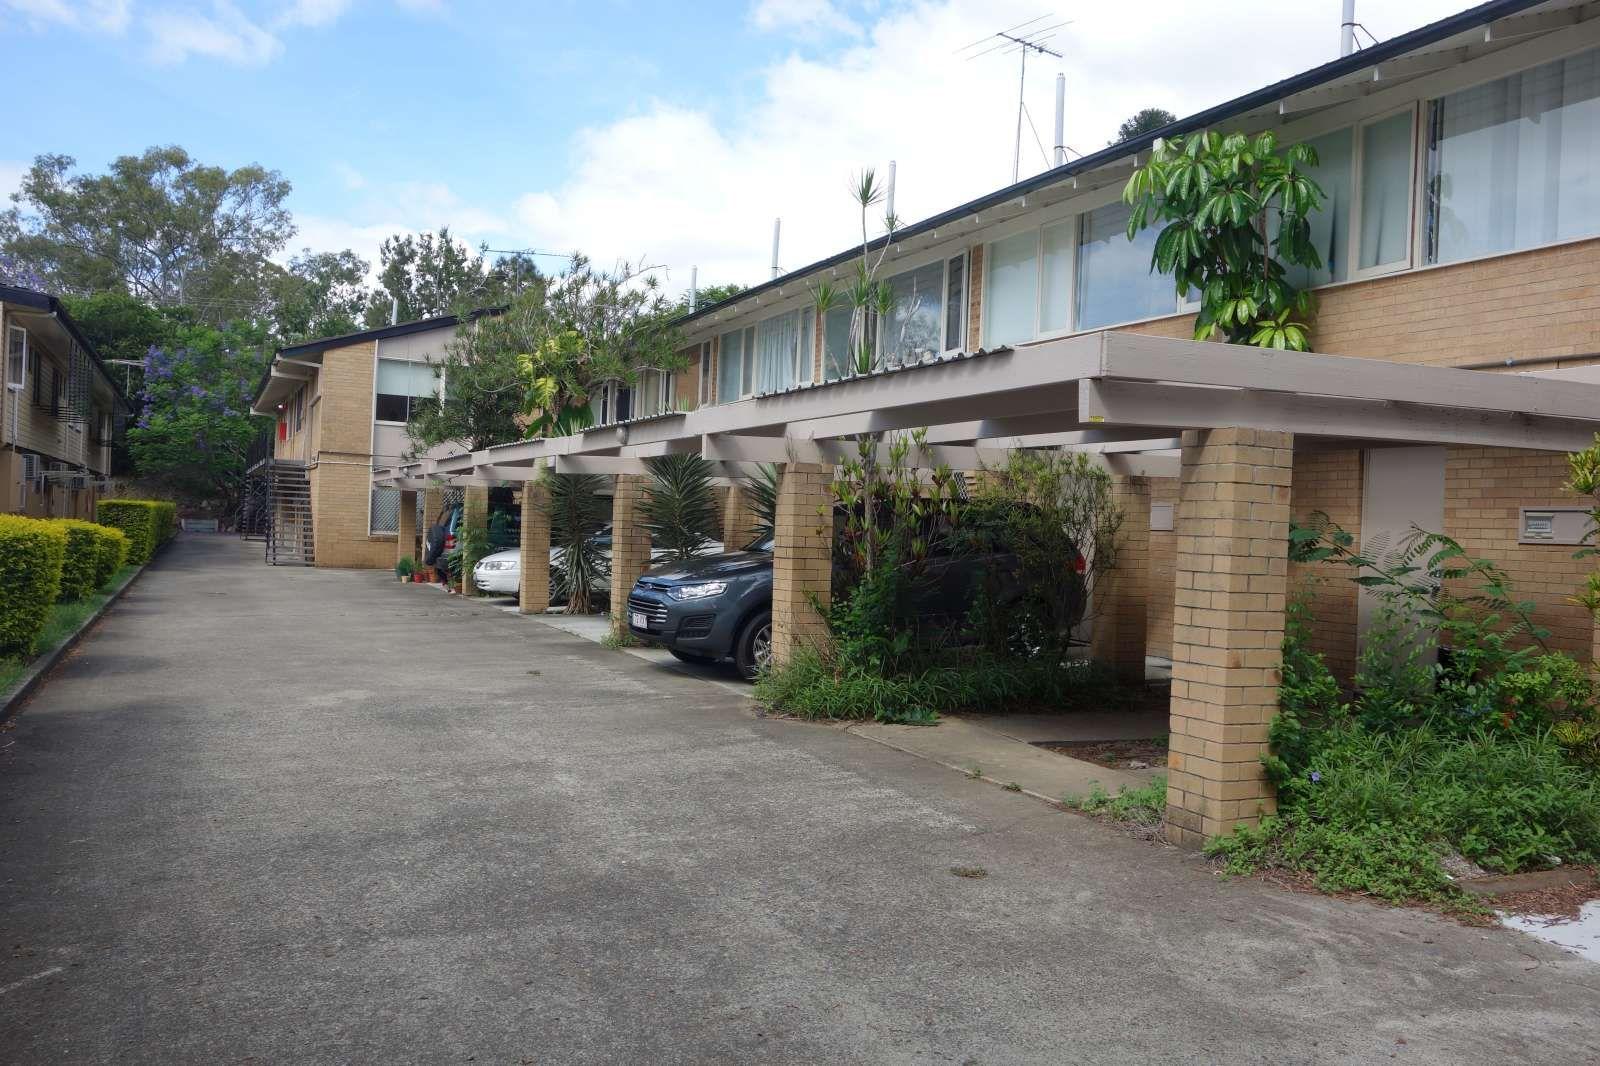 10/59 Sandford Street, St Lucia QLD 4067, Image 0